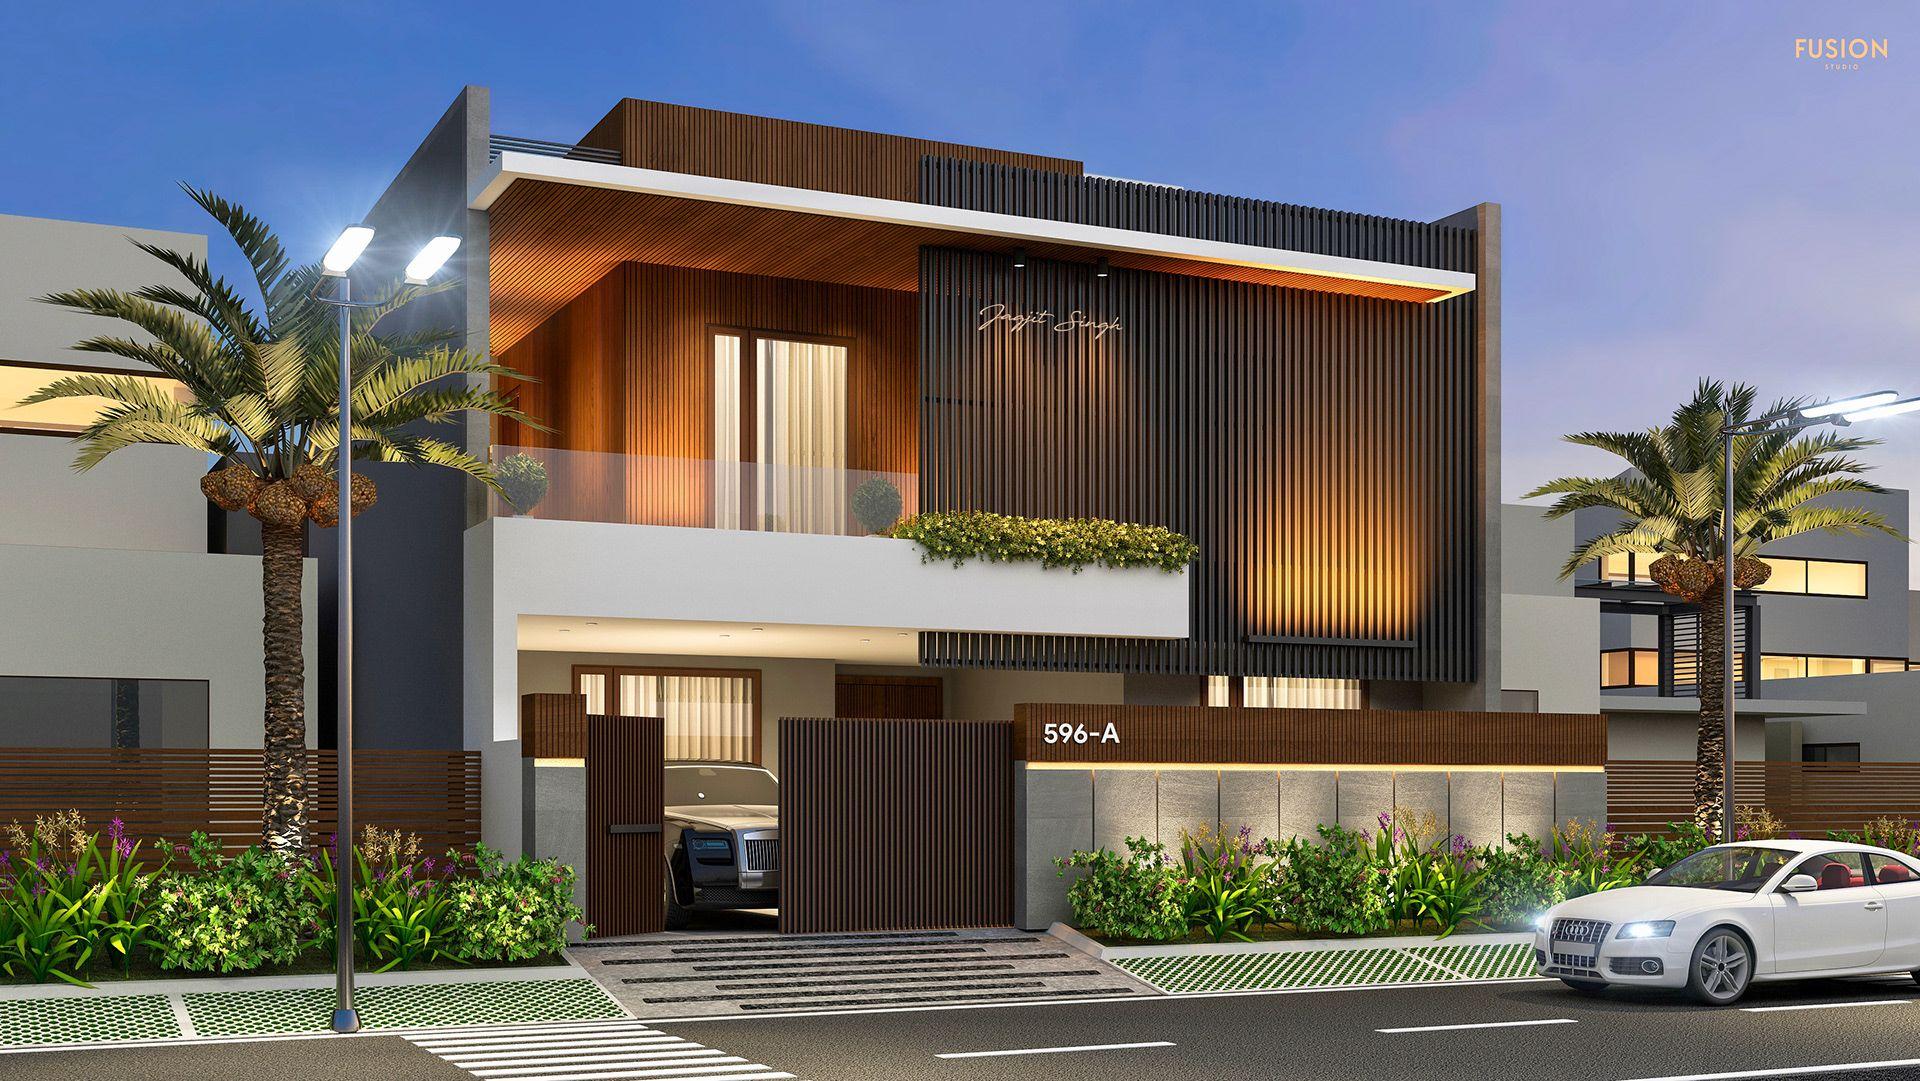 99d92f483004a3298449f552b8f2d460 - 21+ Latest Modern Small House Modern House Design 2020 Pics